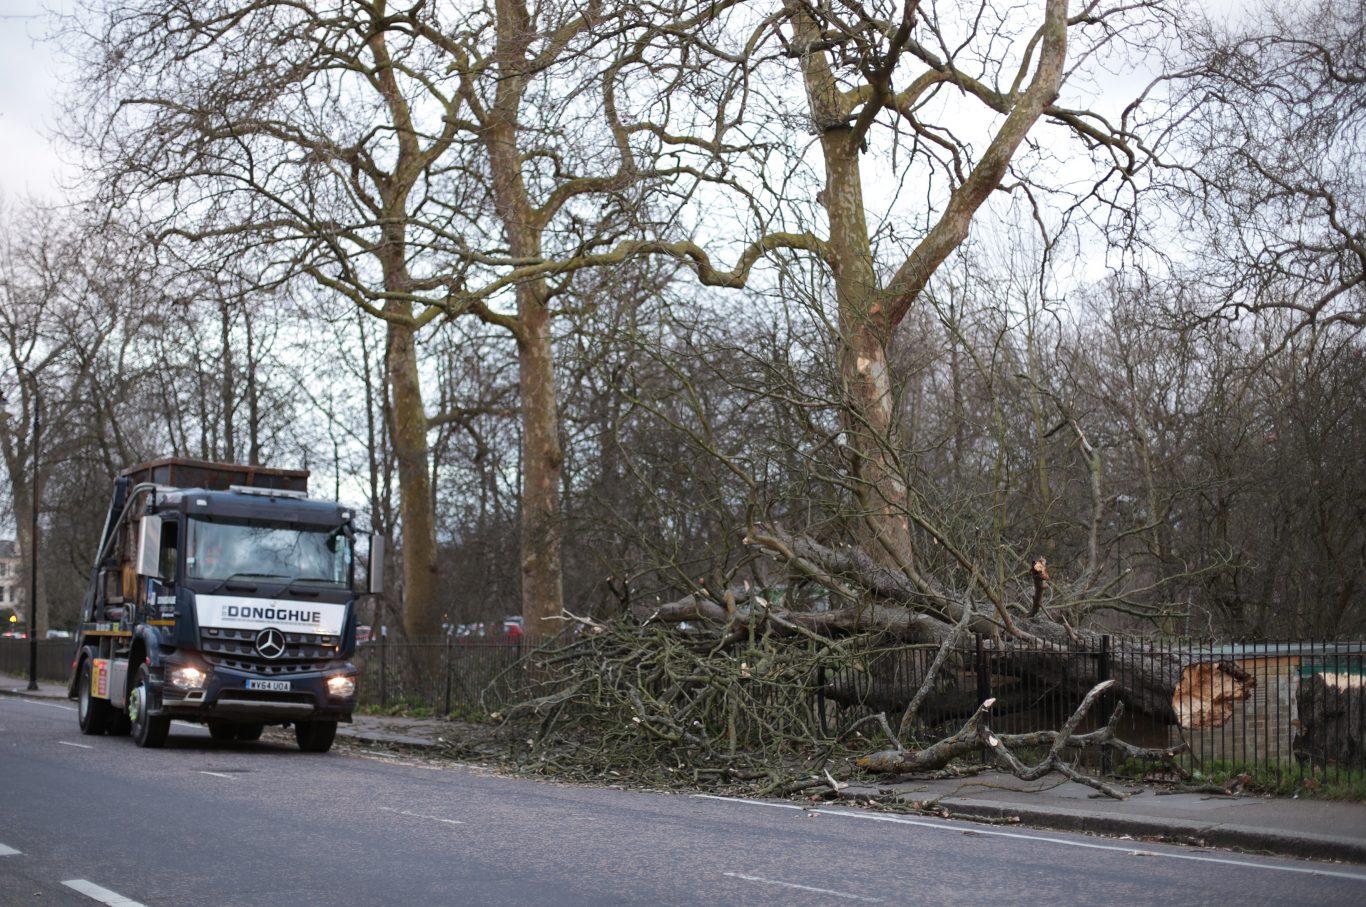 A fallen tree in Regent's Park, London, after Storm Doris reached nearly 90mph  (Yui Mok/PA)